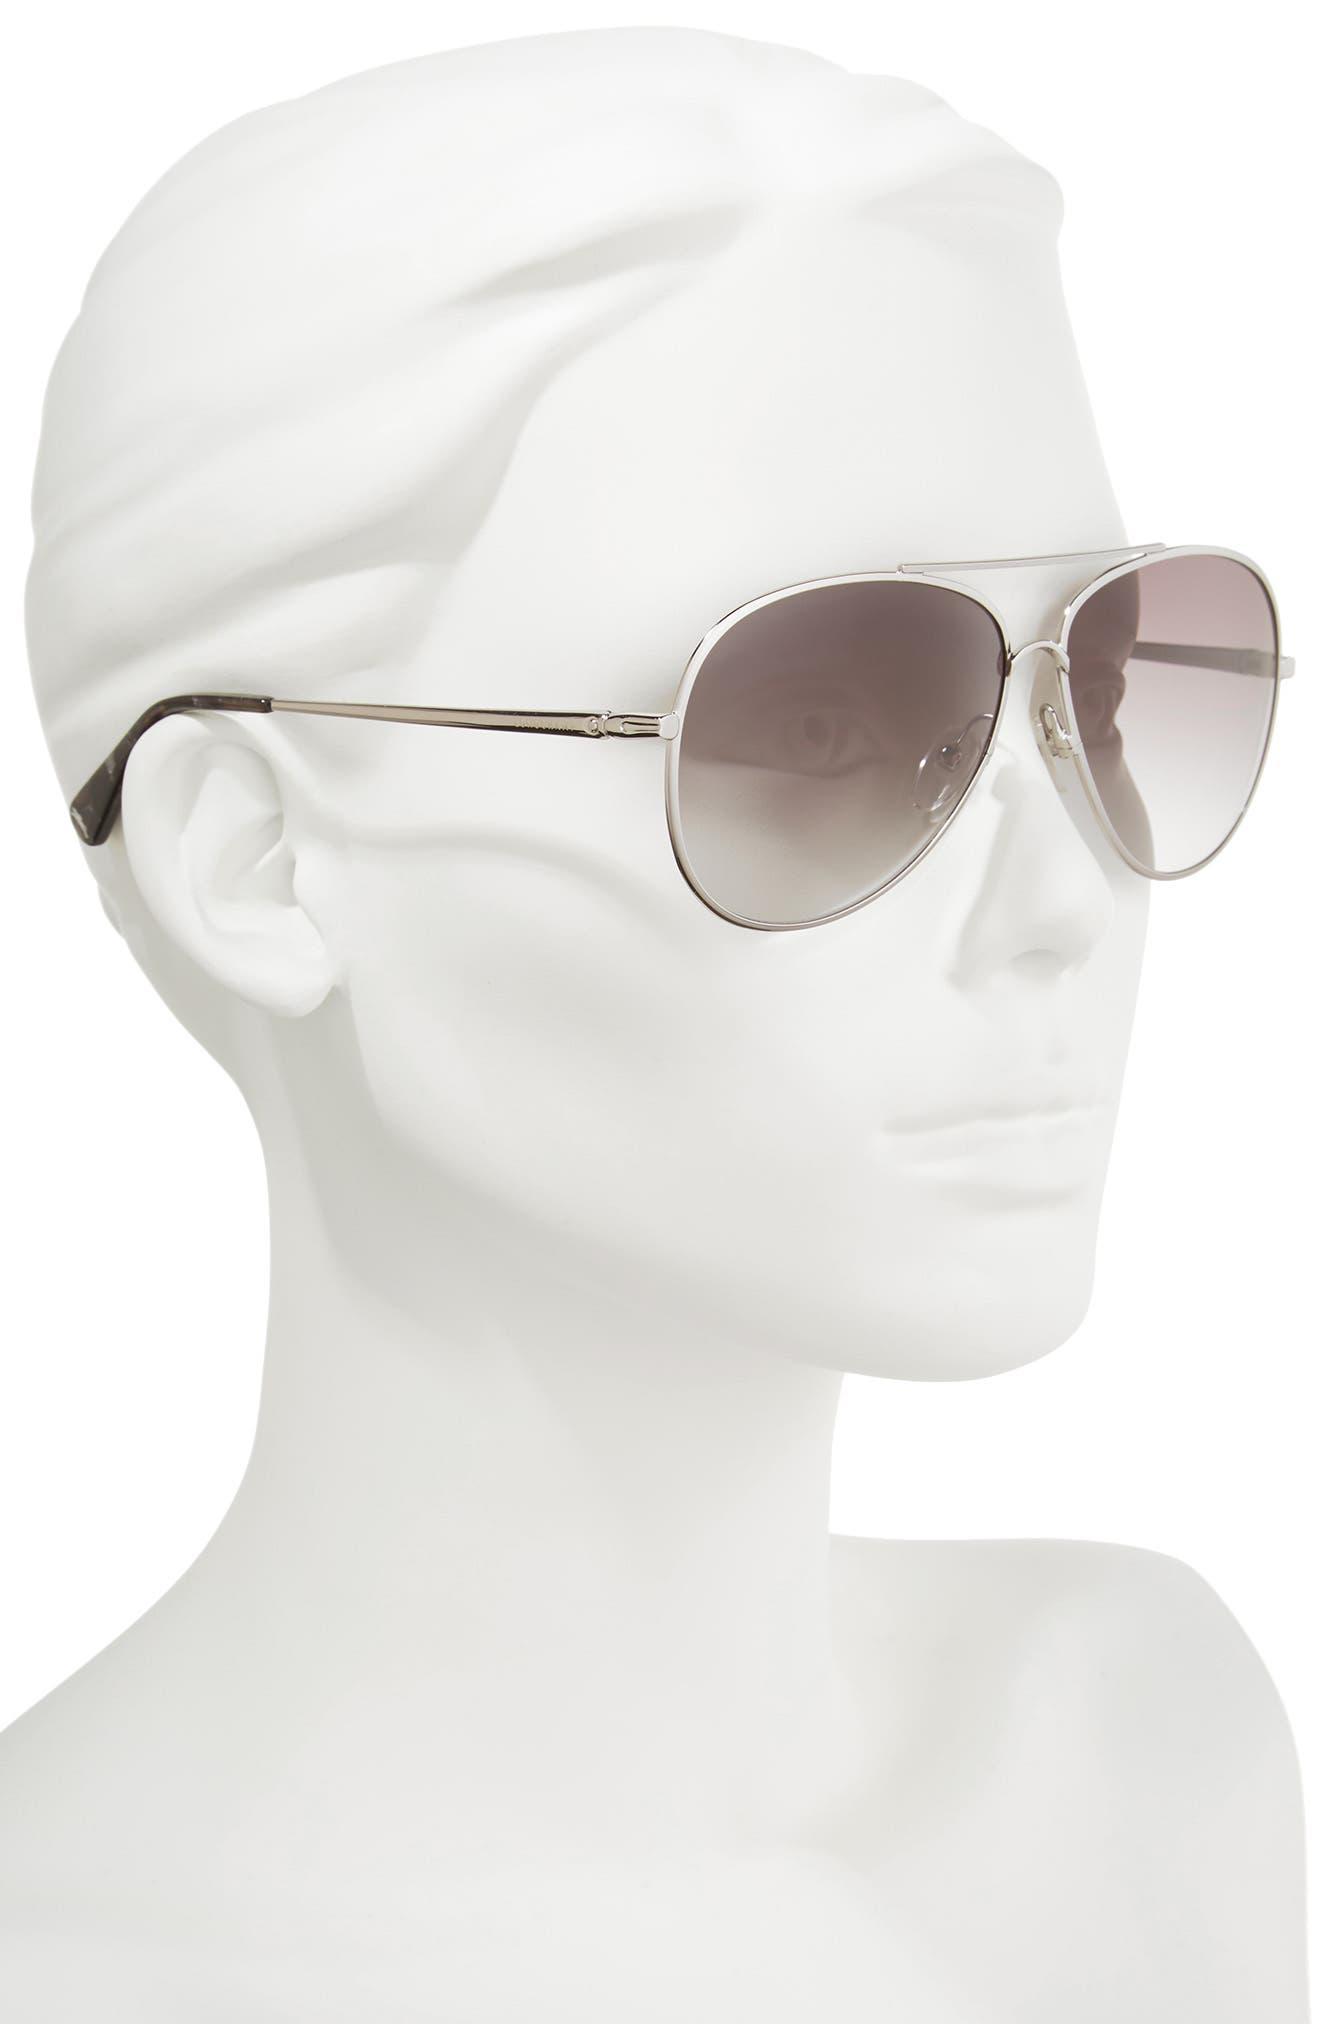 61mm Gradient Lens Aviator Sunglasses,                             Alternate thumbnail 2, color,                             033